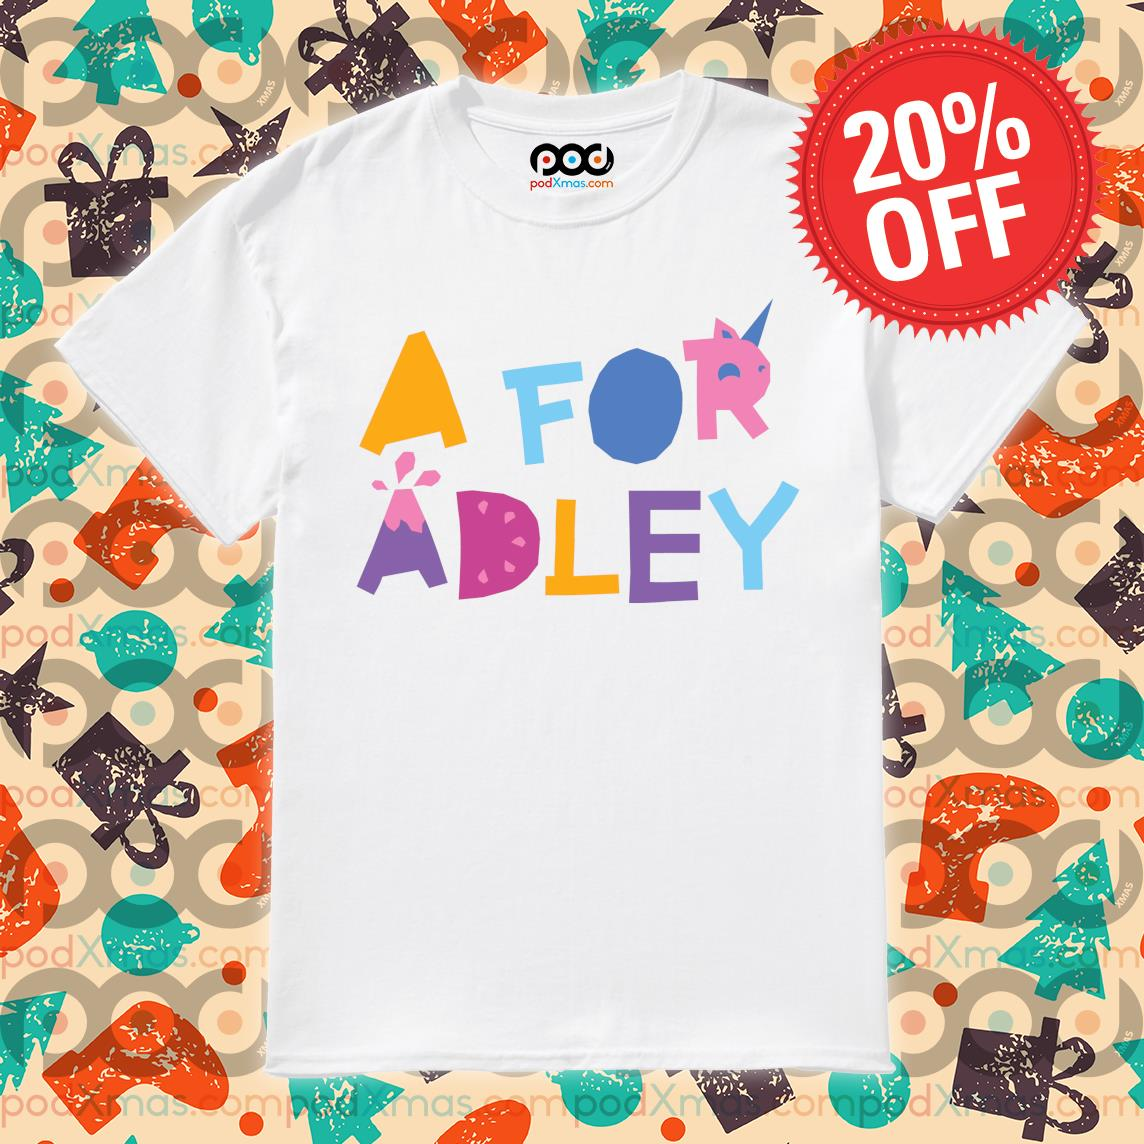 A for Adley shirt